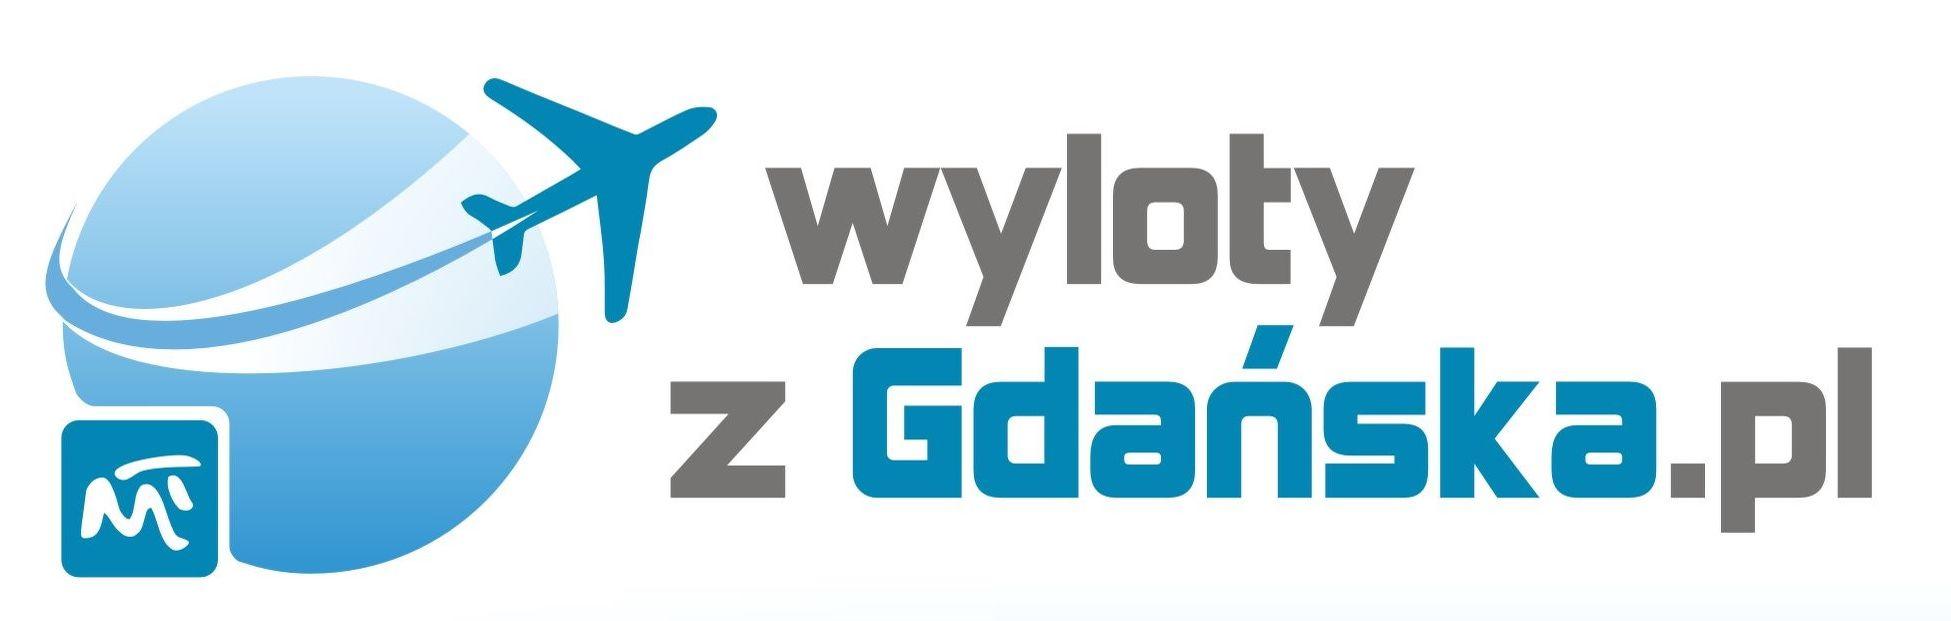 WYLOTY Z GDAŃSKA.PL